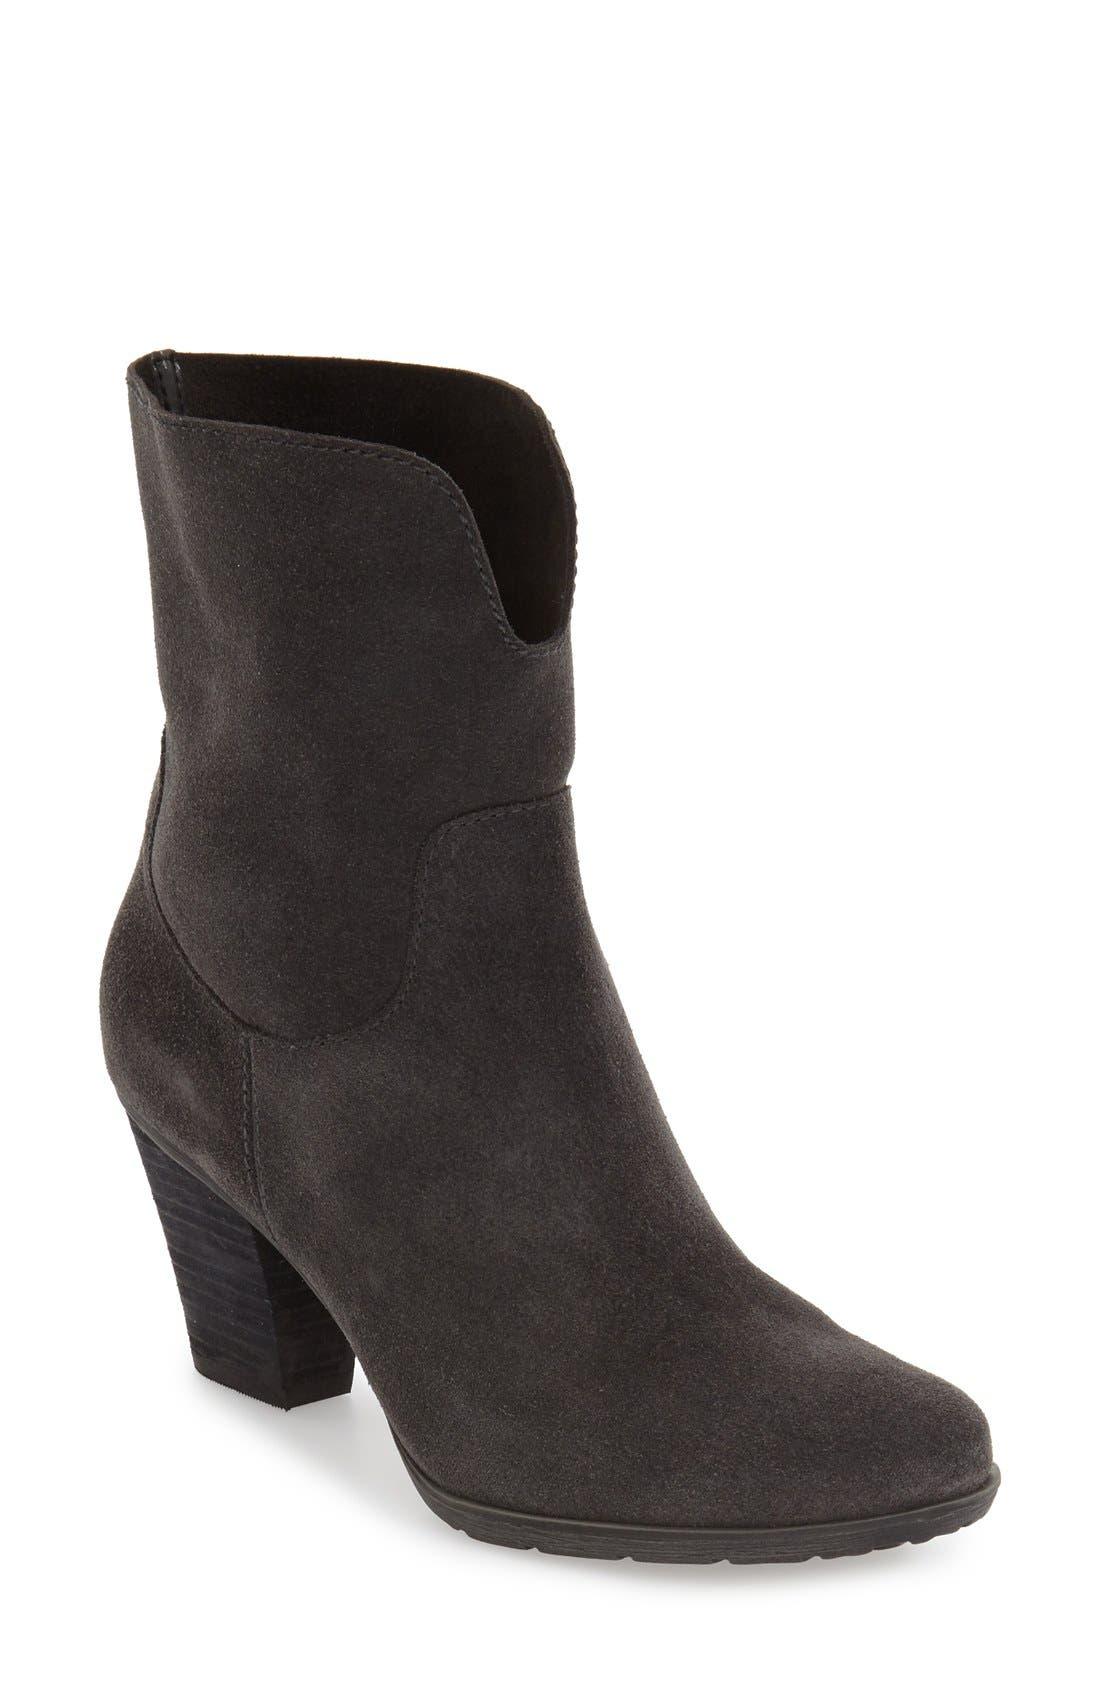 Alternate Image 1 Selected - Blondo Fay Waterproof Ankle Boot (Women)